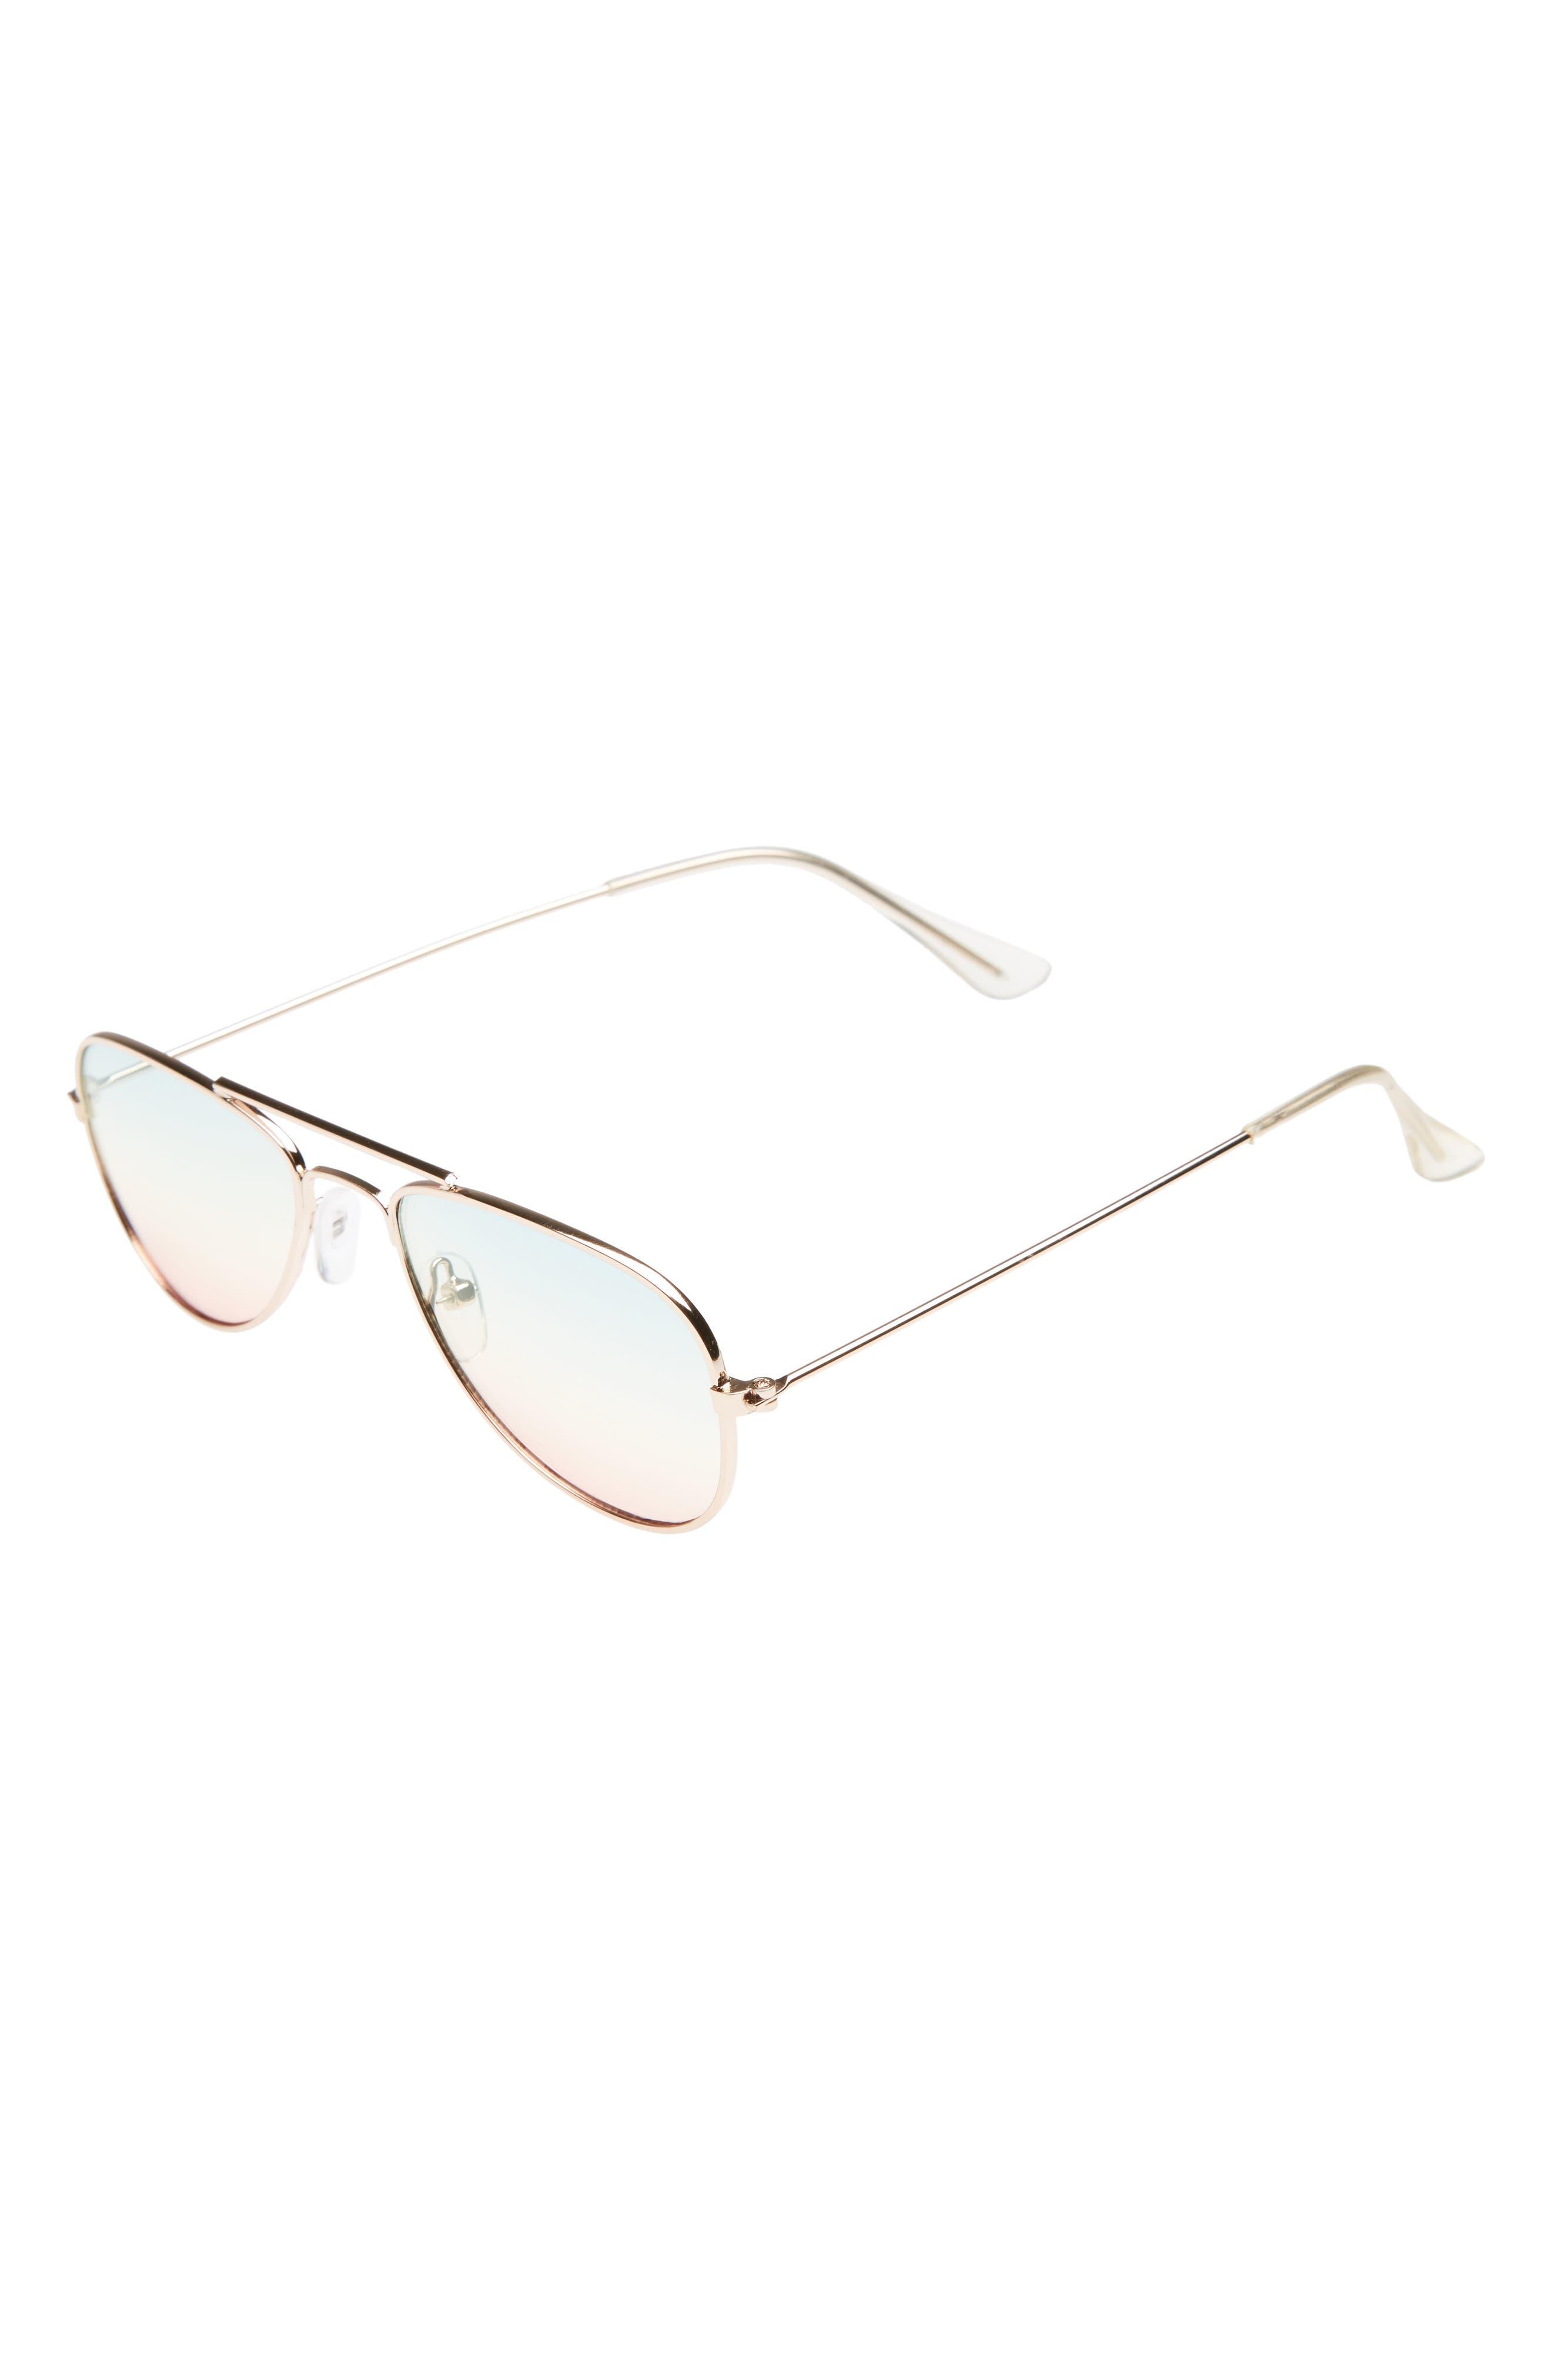 Rainbow Aviator Sunglasses,                             Main thumbnail 1, color,                             710